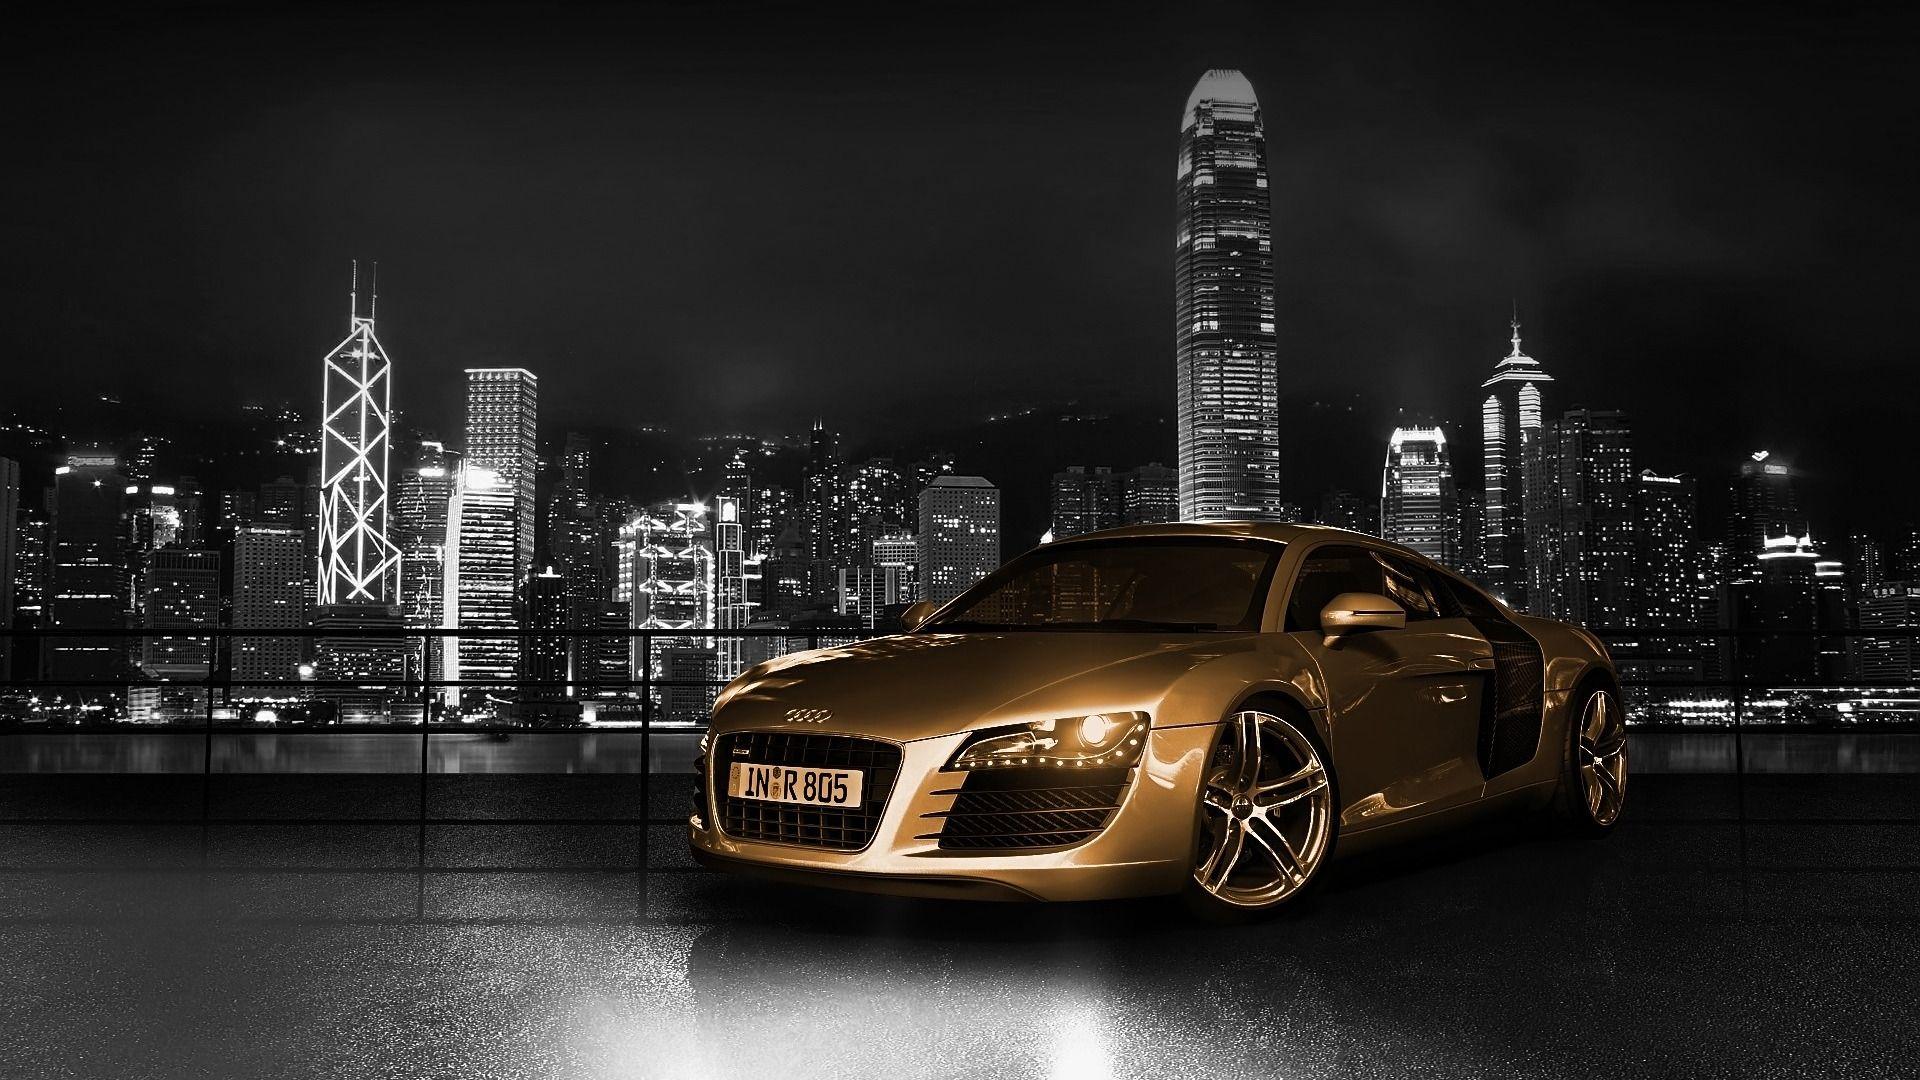 Hd Wallpapers Widescreen 1080p 3d Wallpaper Hd Widescreen 4 Wallpapers Point Audi Cars Audi R8 Wallpaper Car Hd